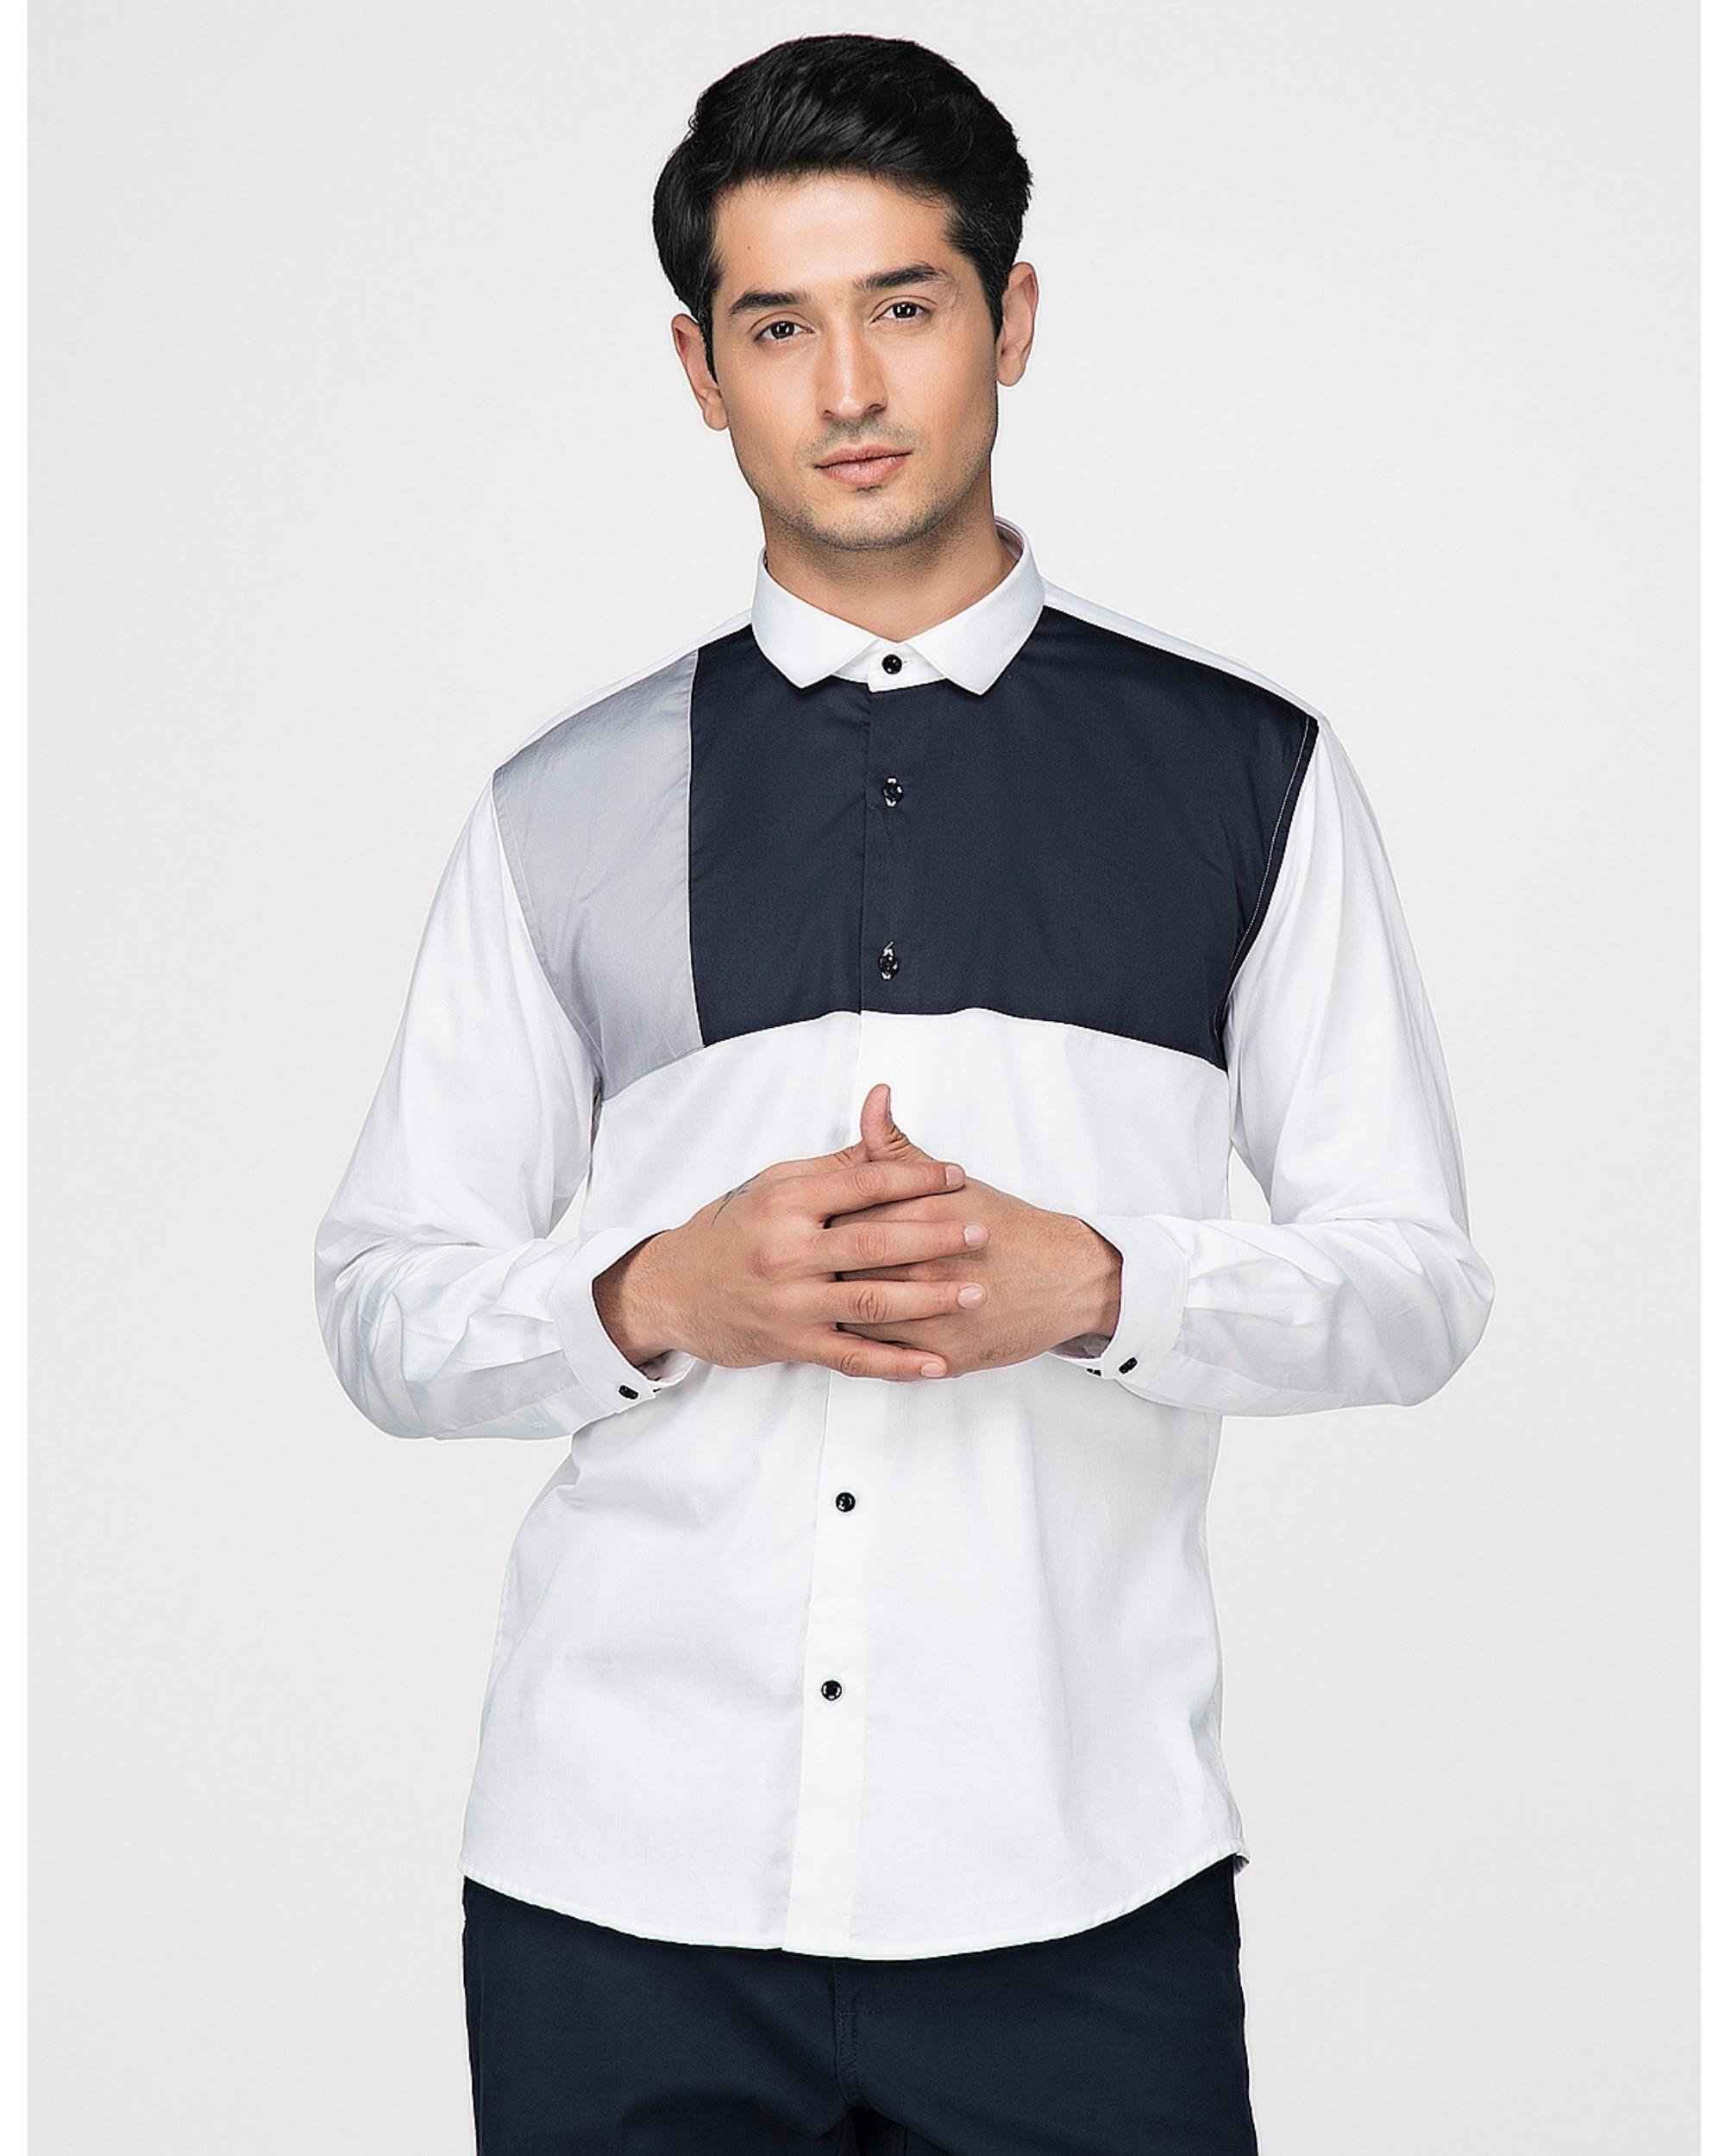 White and navy blue block paneled shirt